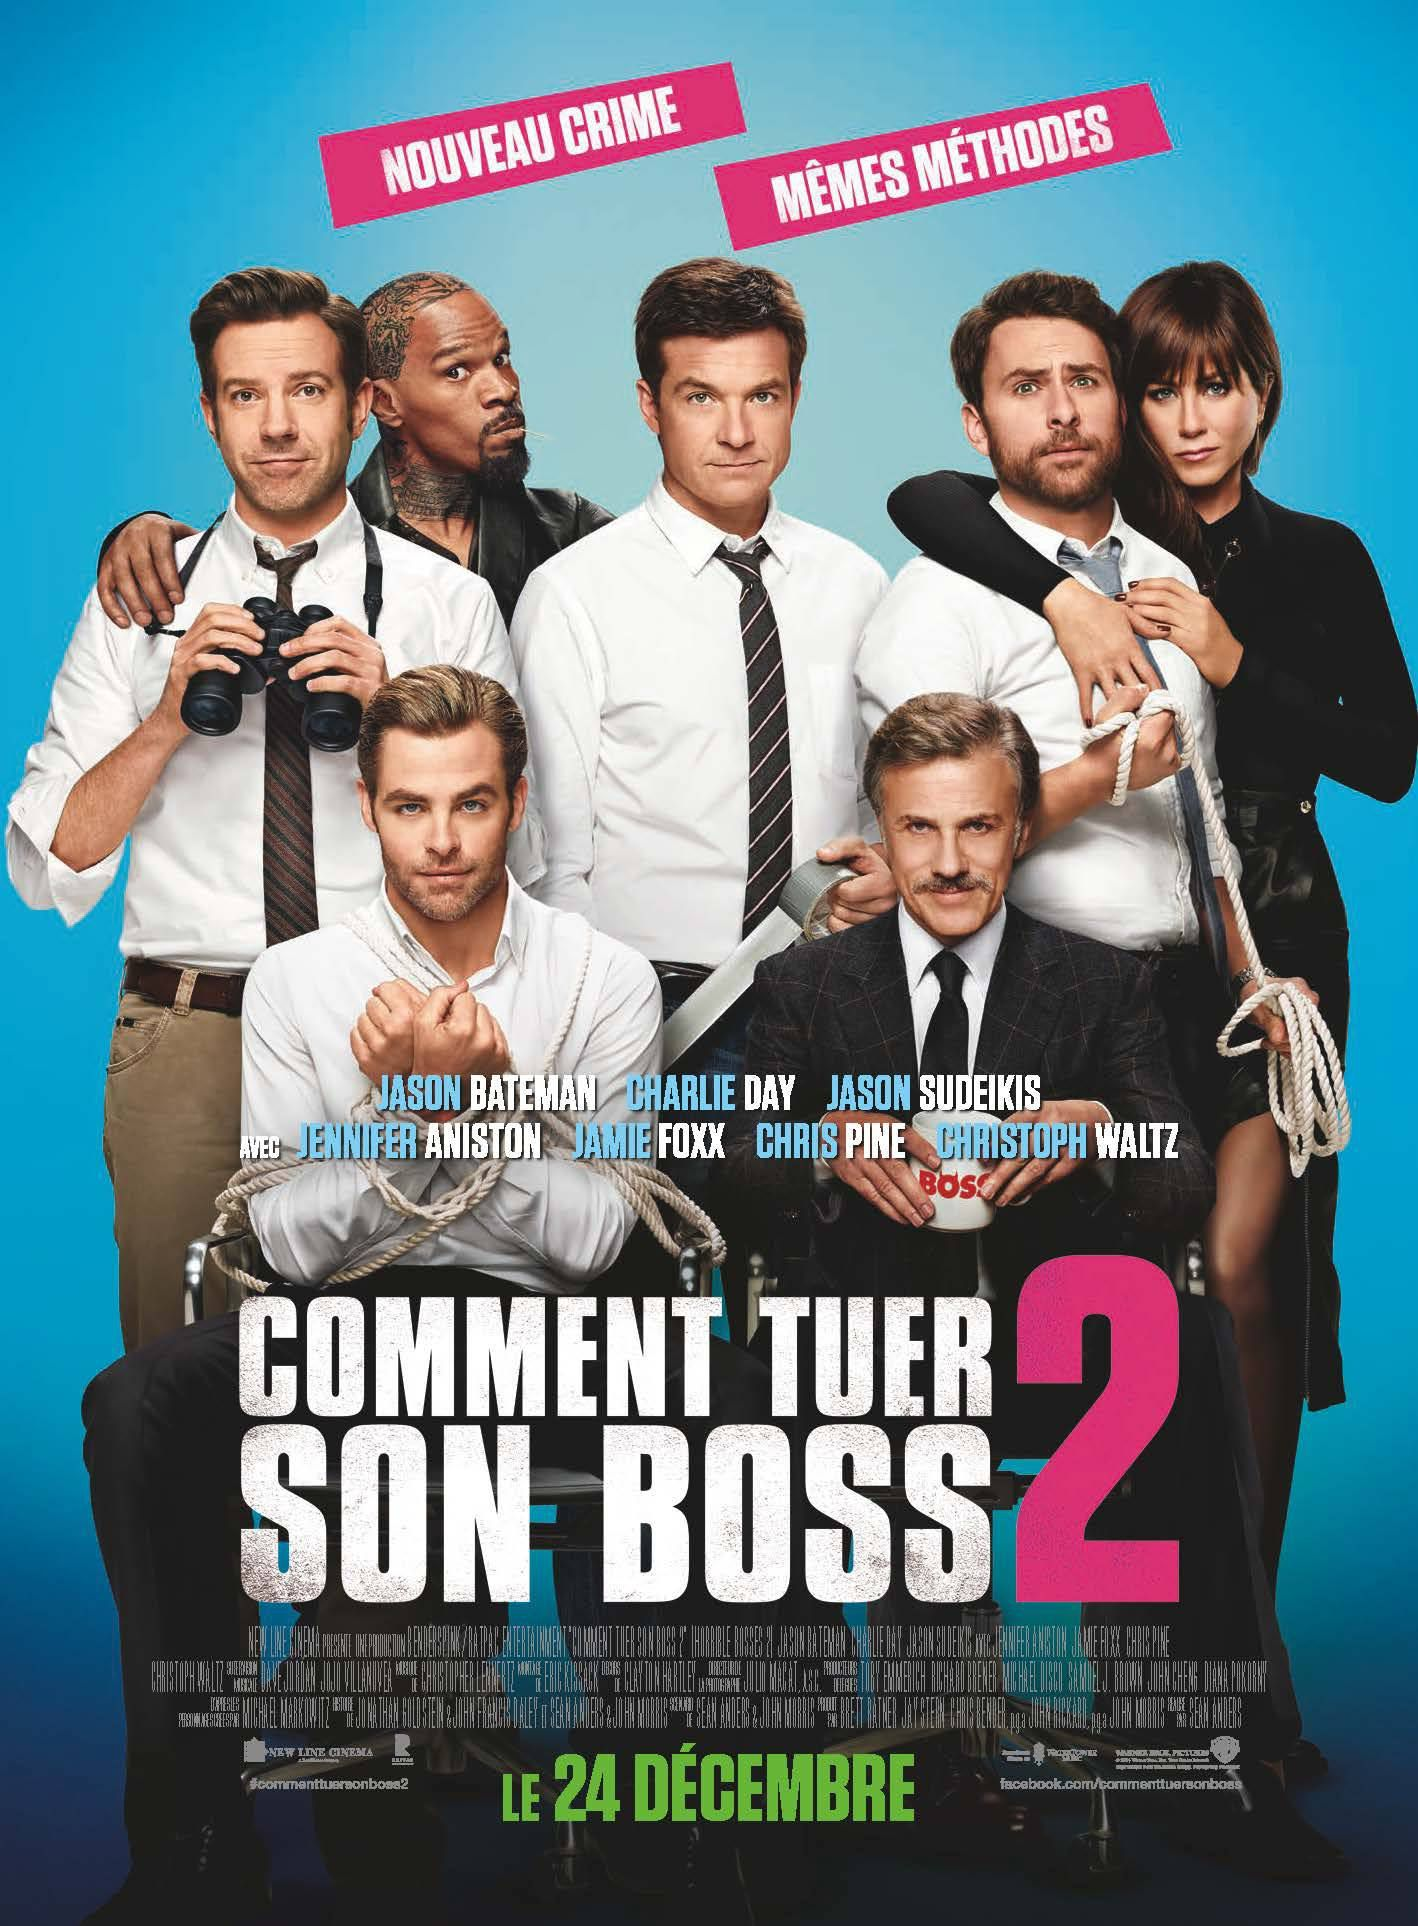 Comment tuer son boss 2 - Film (2014)